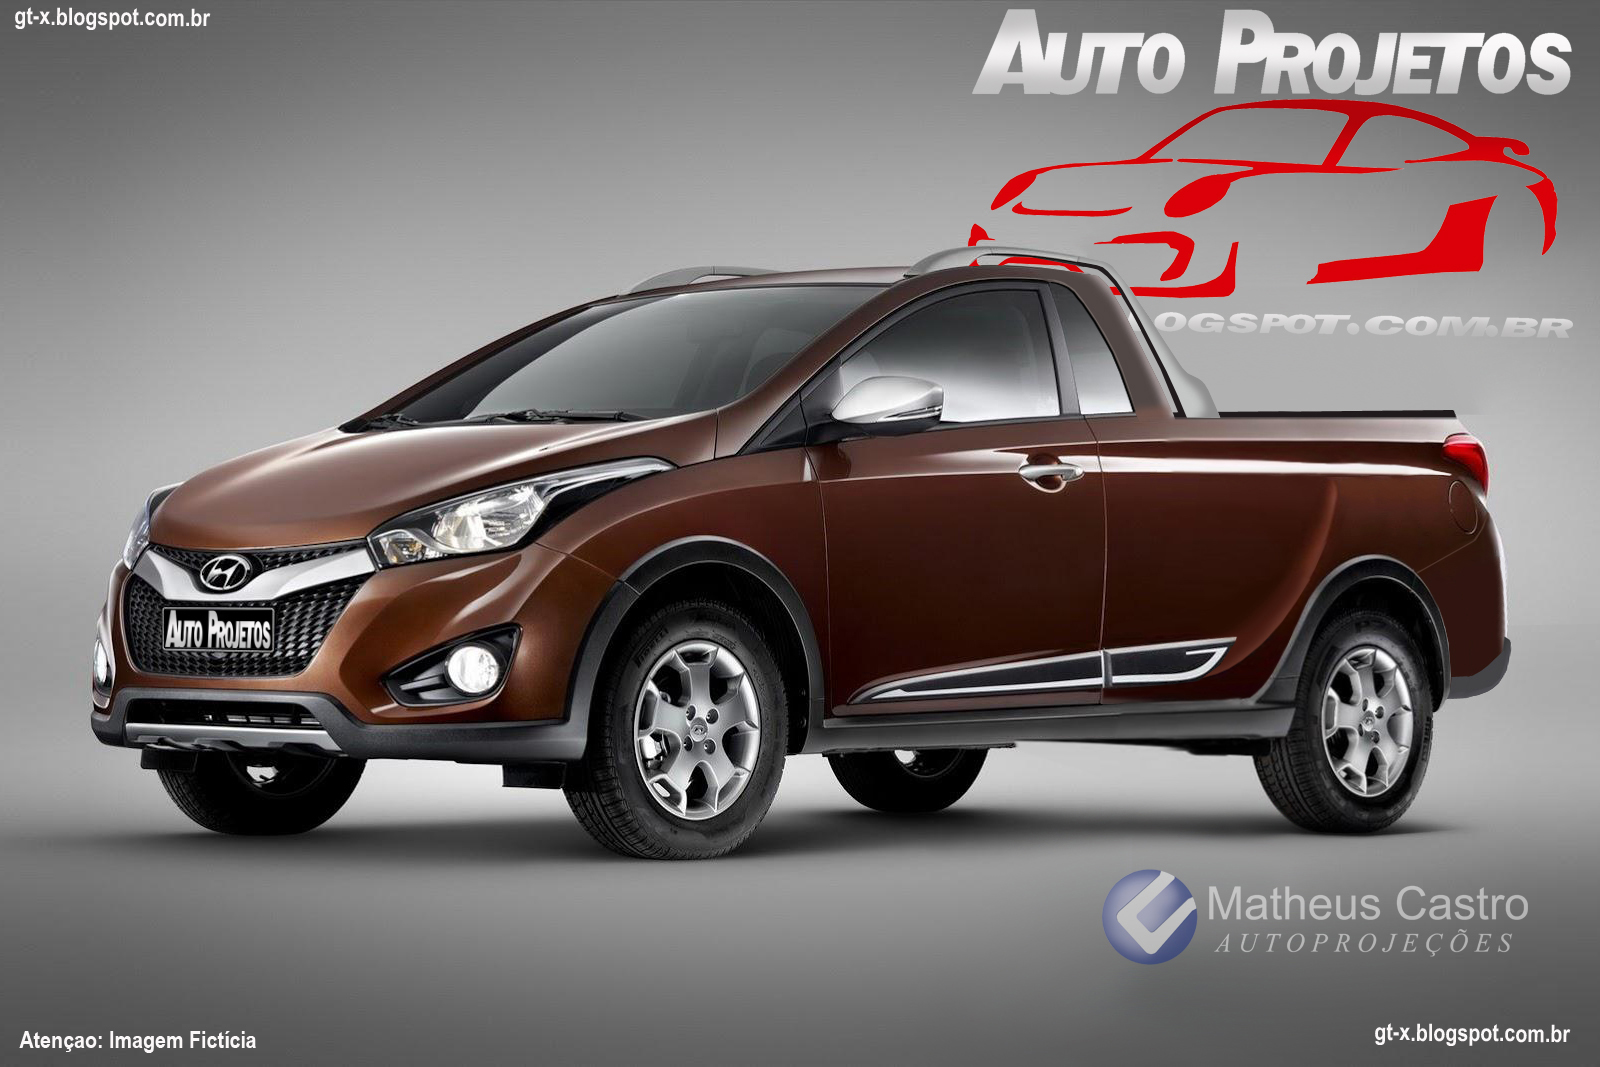 Auto Projetos Hyundai Hb 20 Picape Hb 20 Up